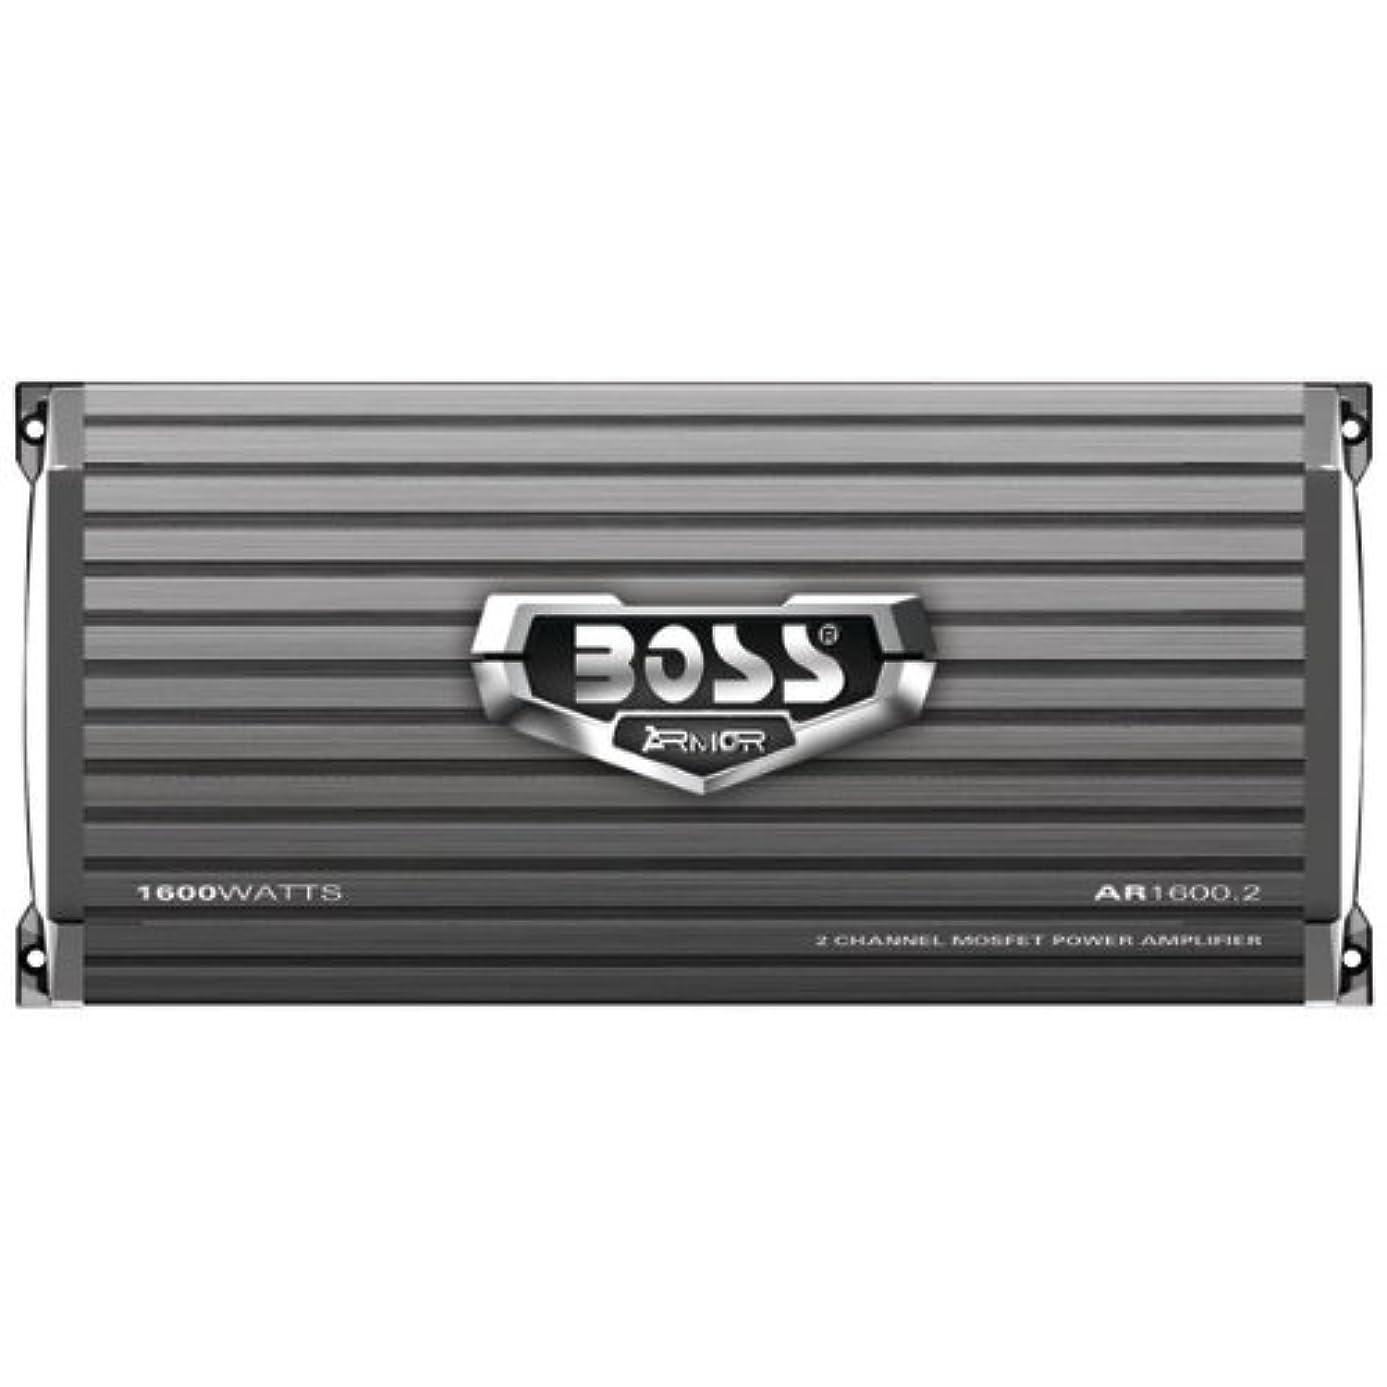 NEW BOSS AR1600.2 1600W 2-Channel Car Audio Amplifier Power Amp + Remote AR16002